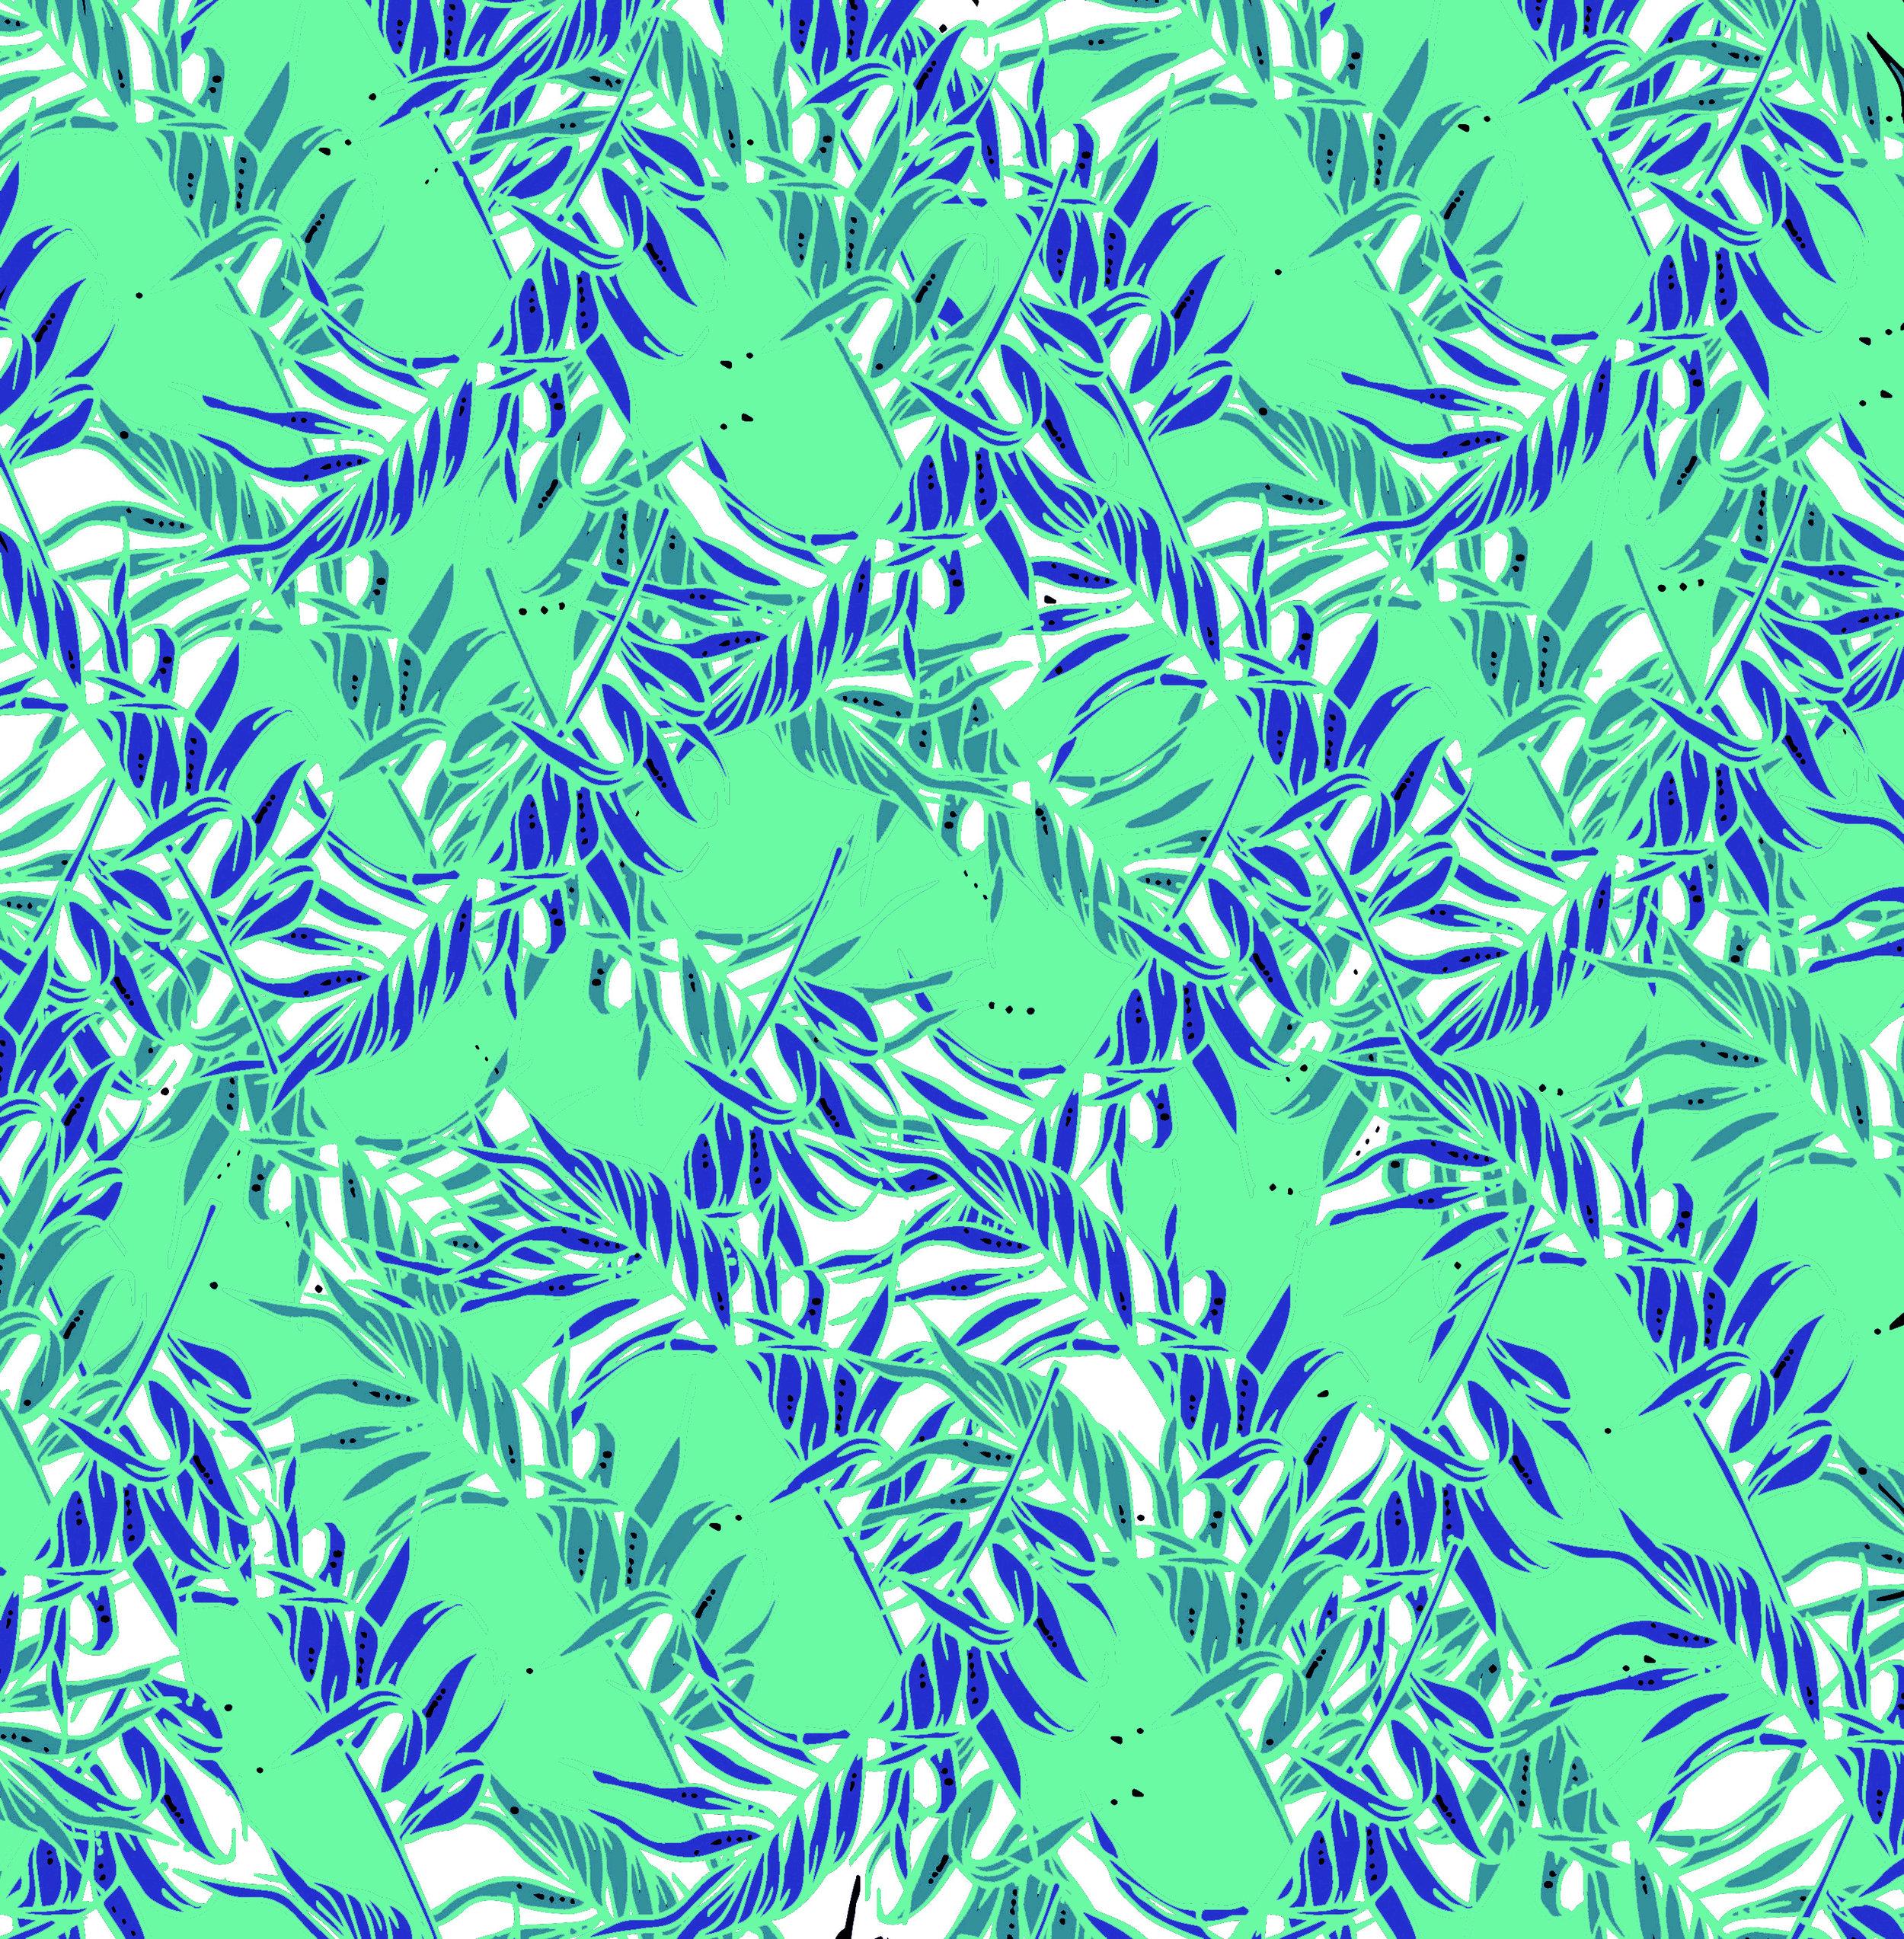 tropical branch wallpaper.jpg